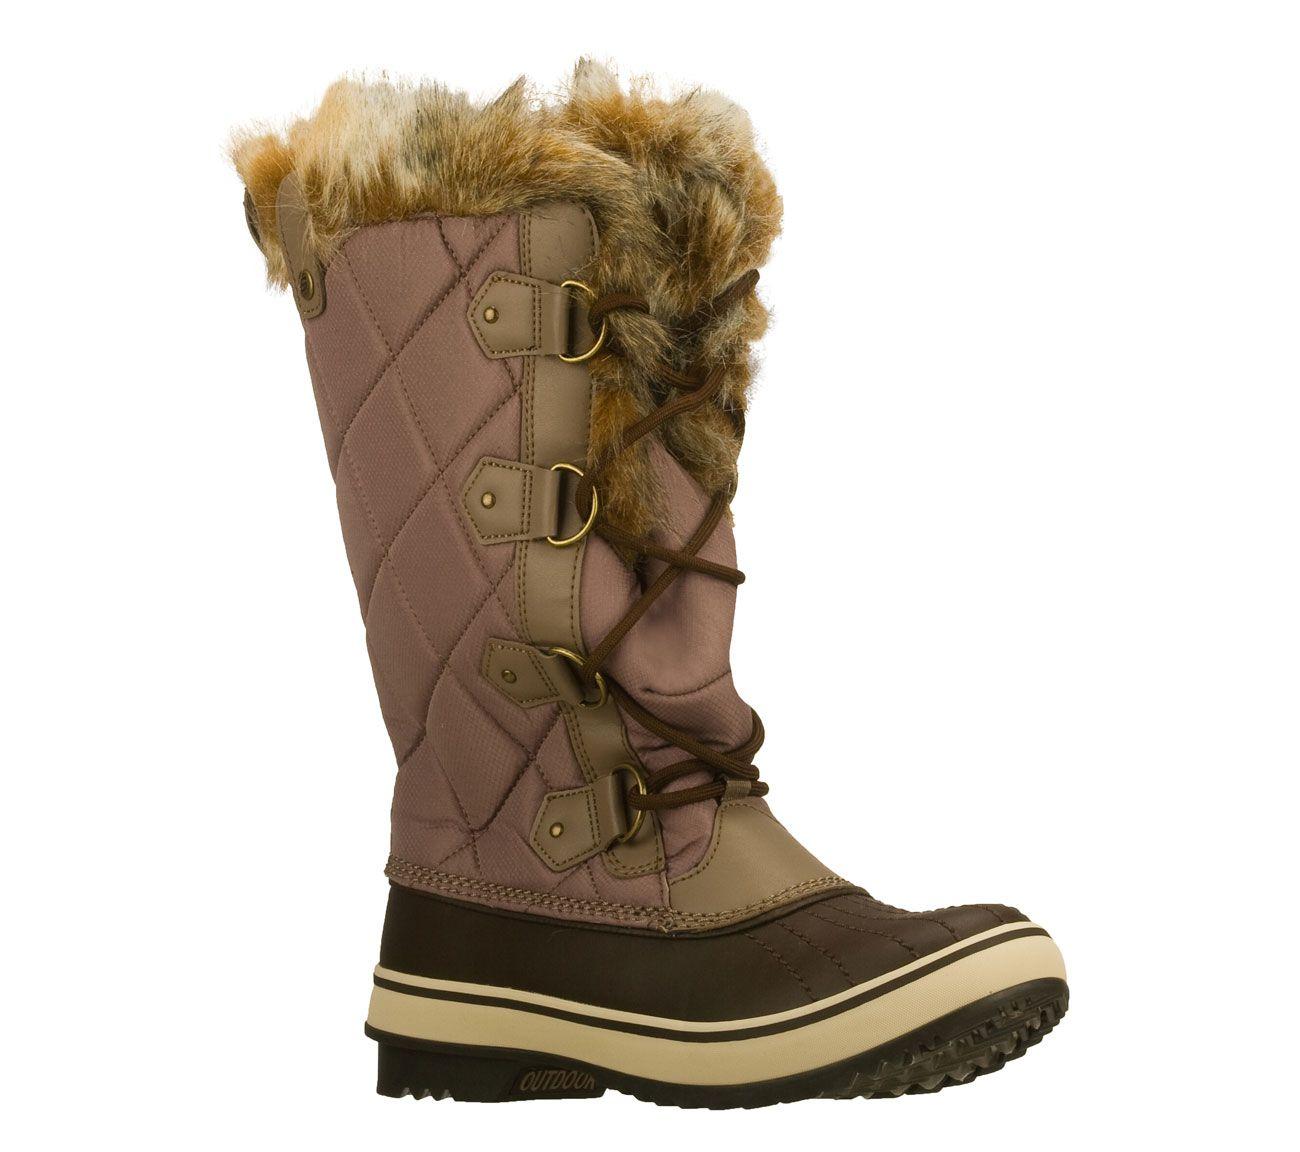 Buy SKECHERS Women's Highlanders - Matterhorn Mountain Boots only £76.00  Get Ready For Winter in Style & Comfort!!